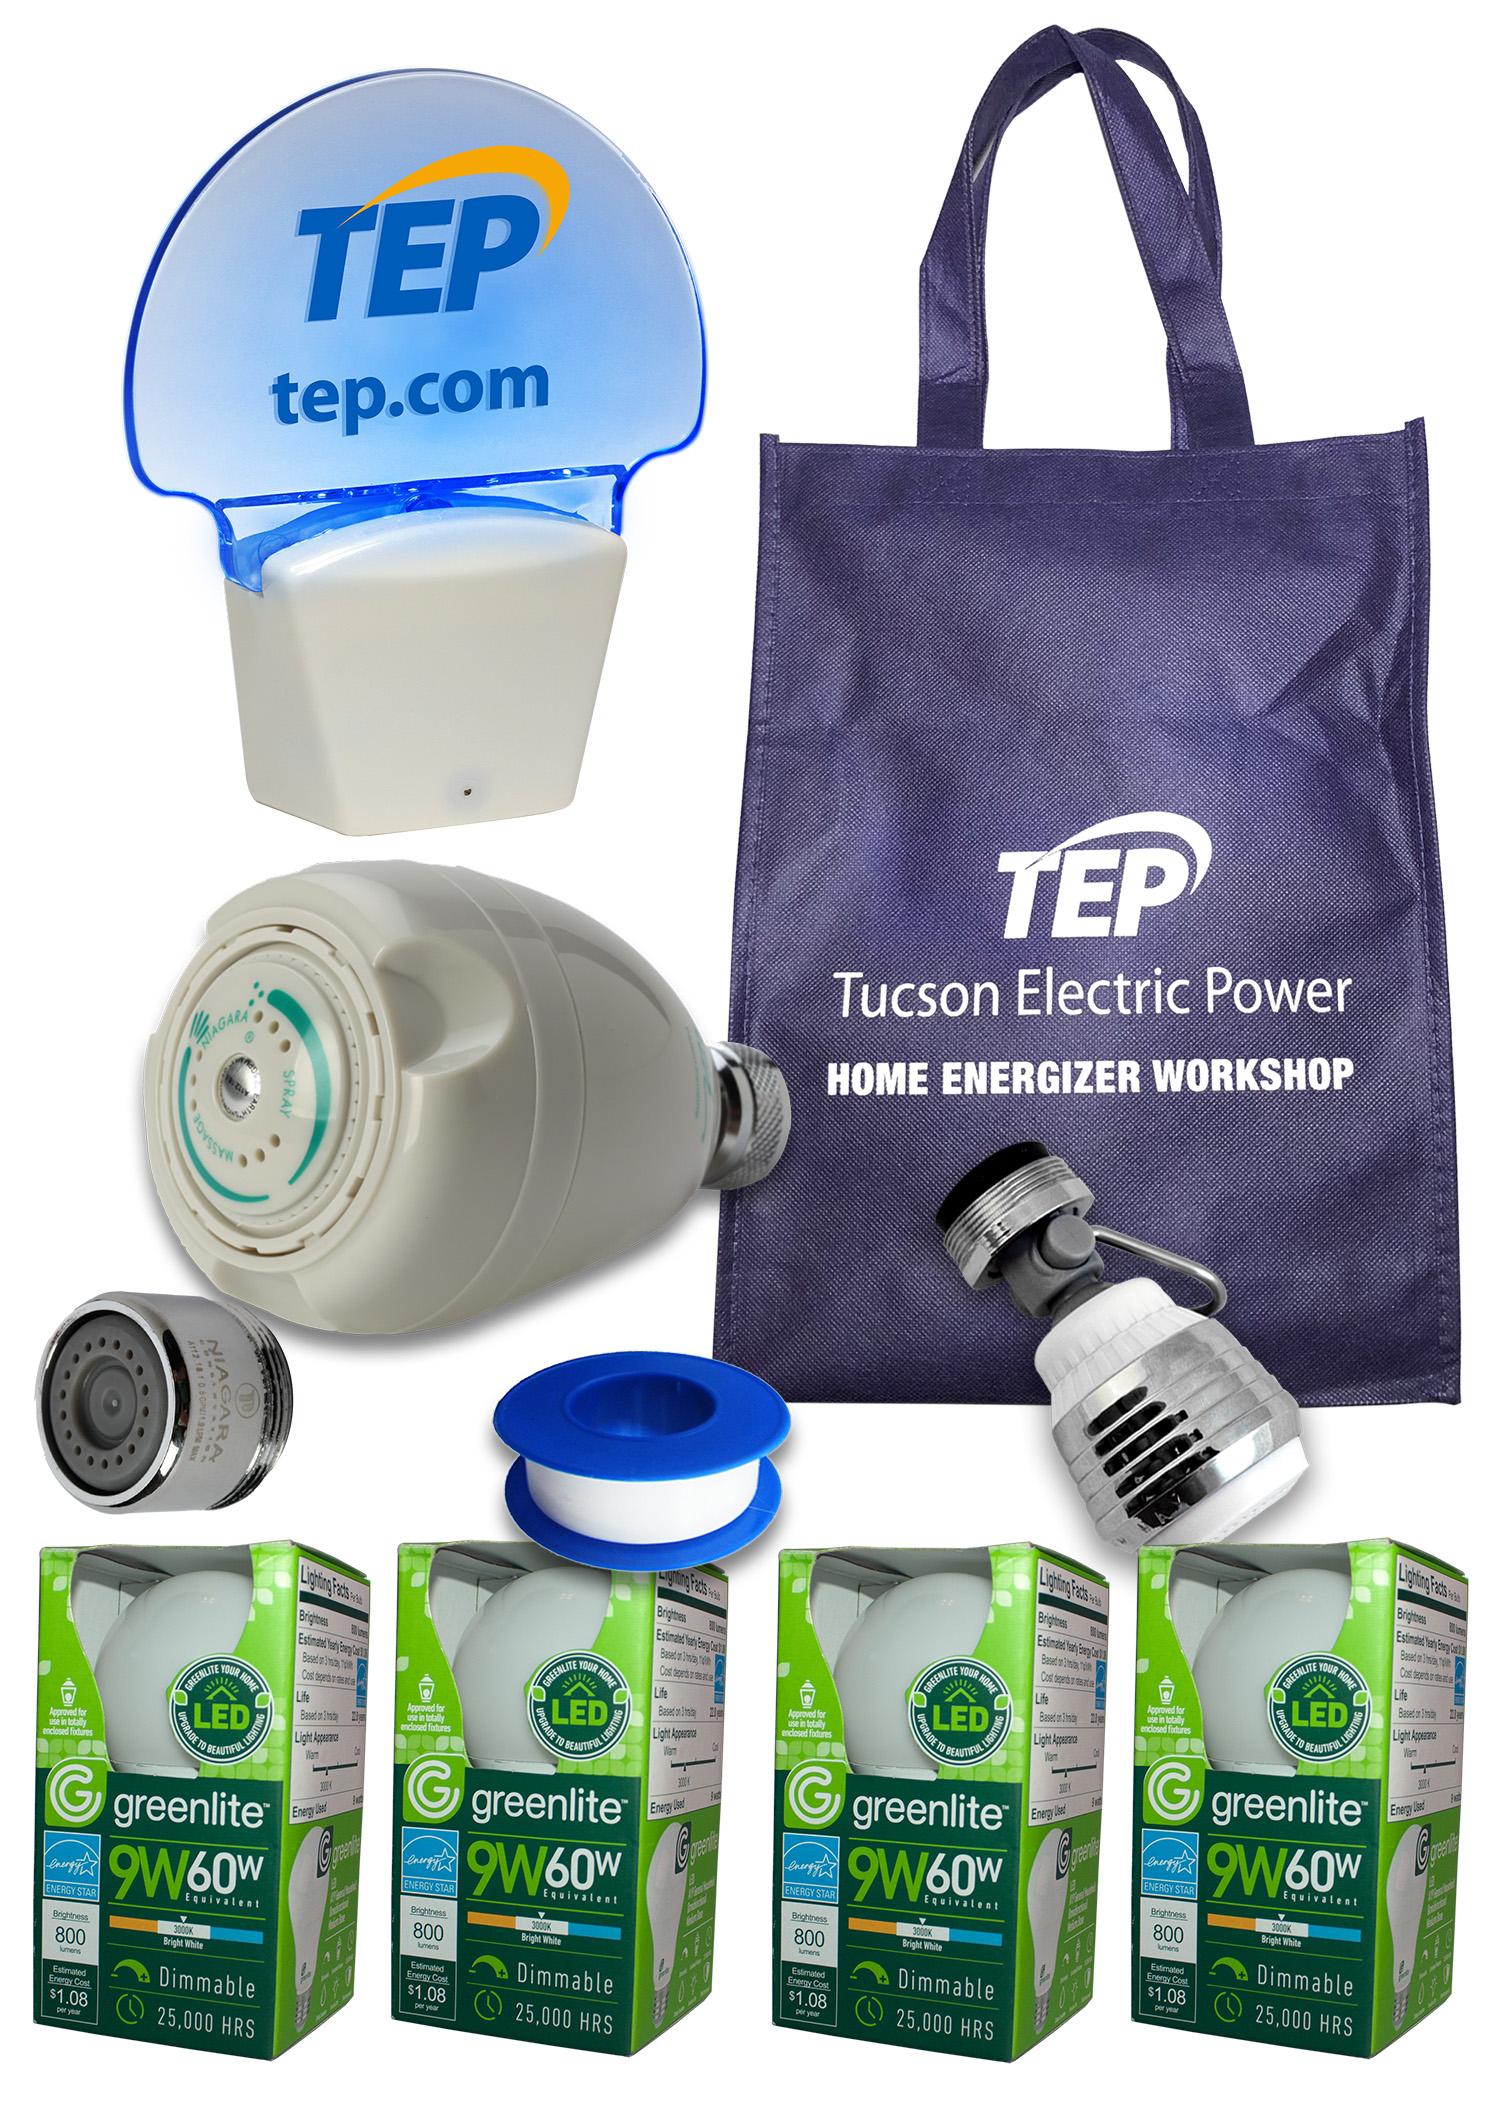 Each participant receives an Energy Efficiency Kit.